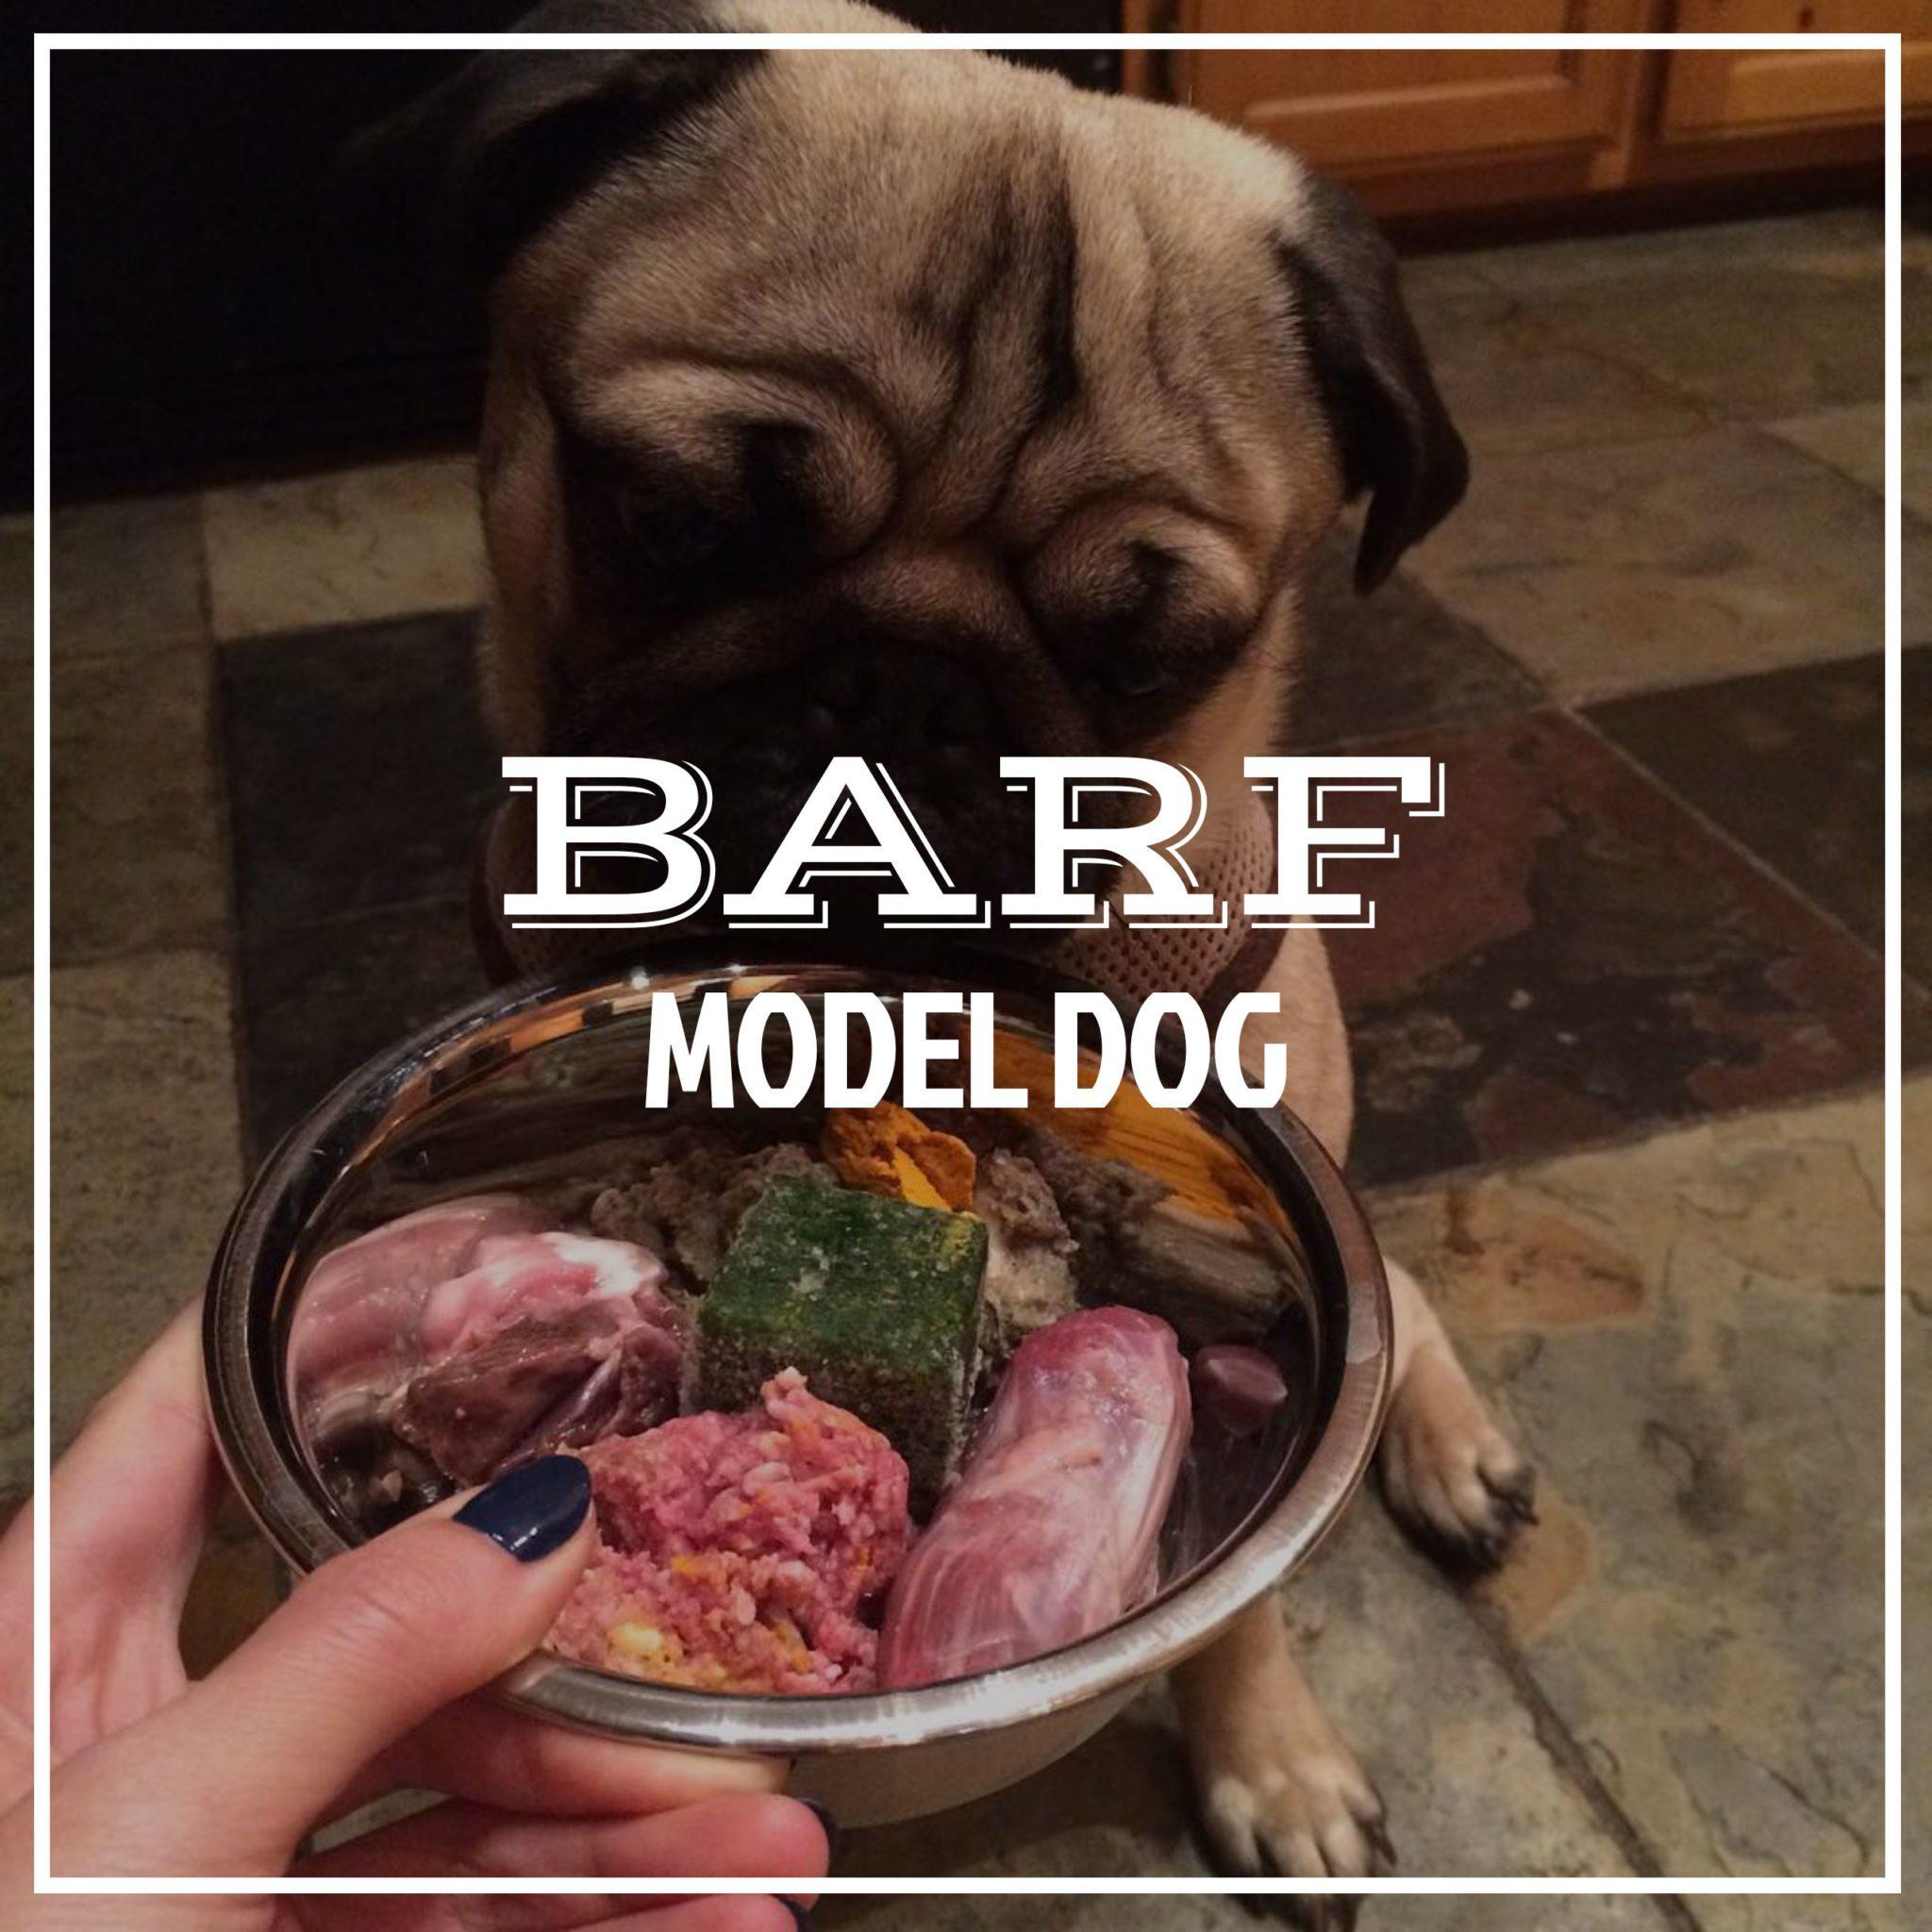 barfdogmodel